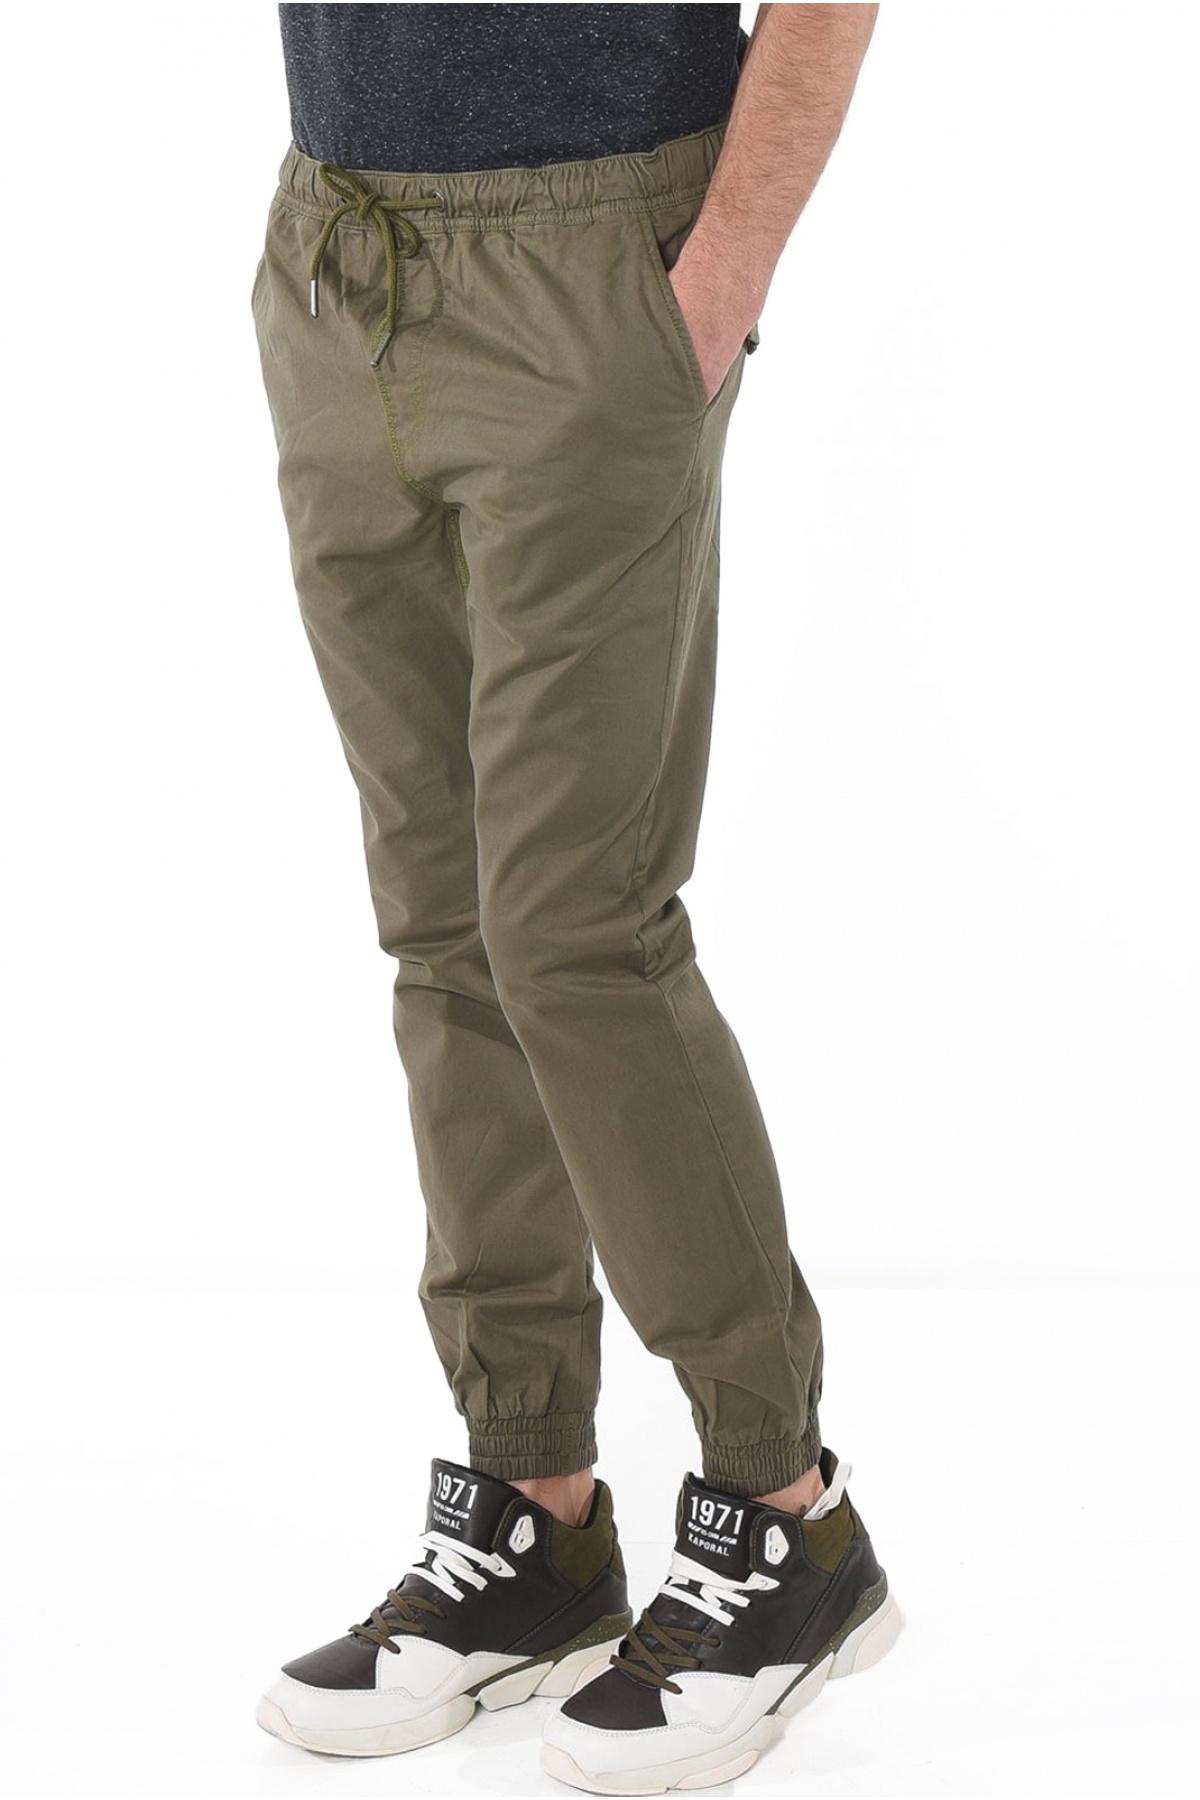 Pantalons Kaporal Homme 30,32,33,34